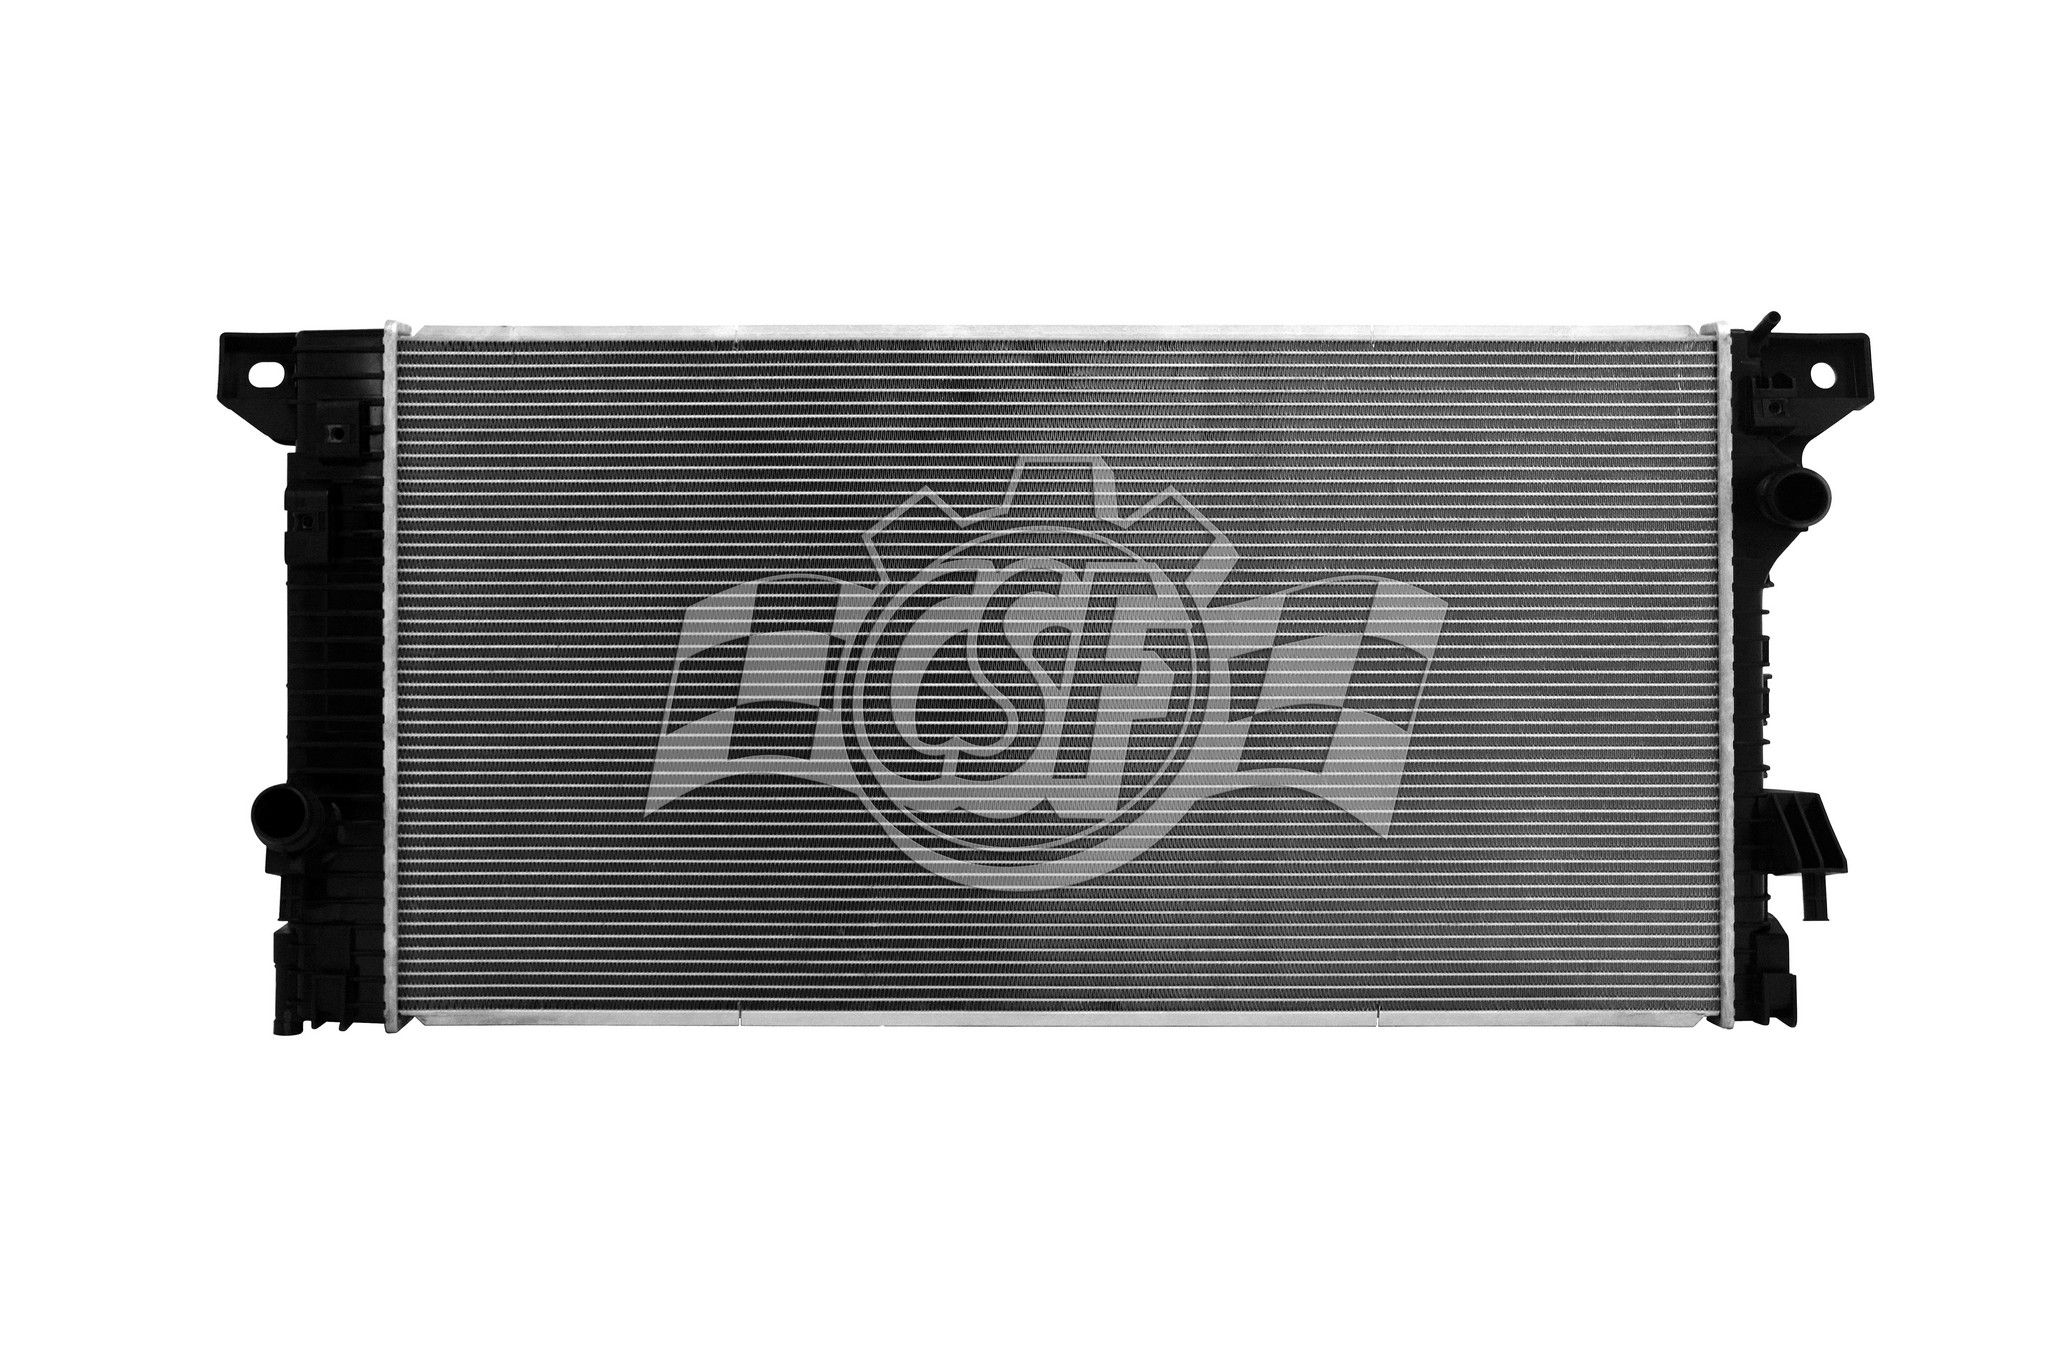 1993 ford f150 5.0 radiator